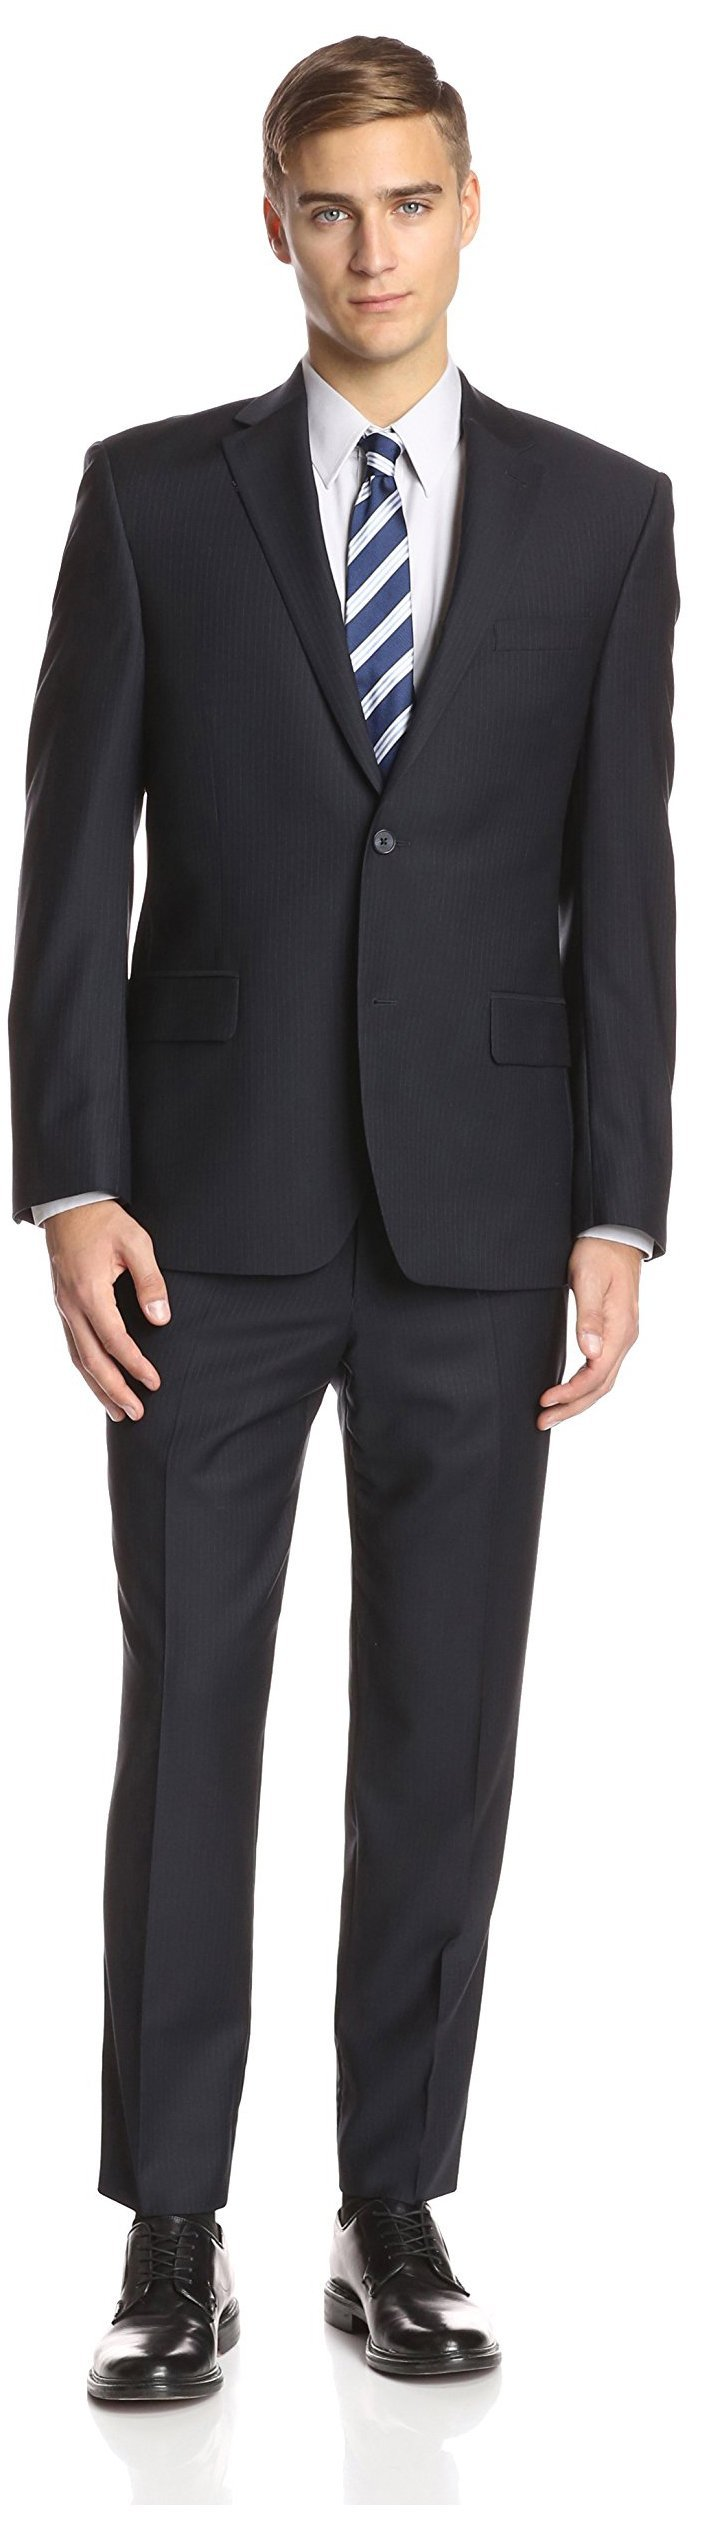 Ike Behar Men's Pinstripe Suit, Navy, 44R